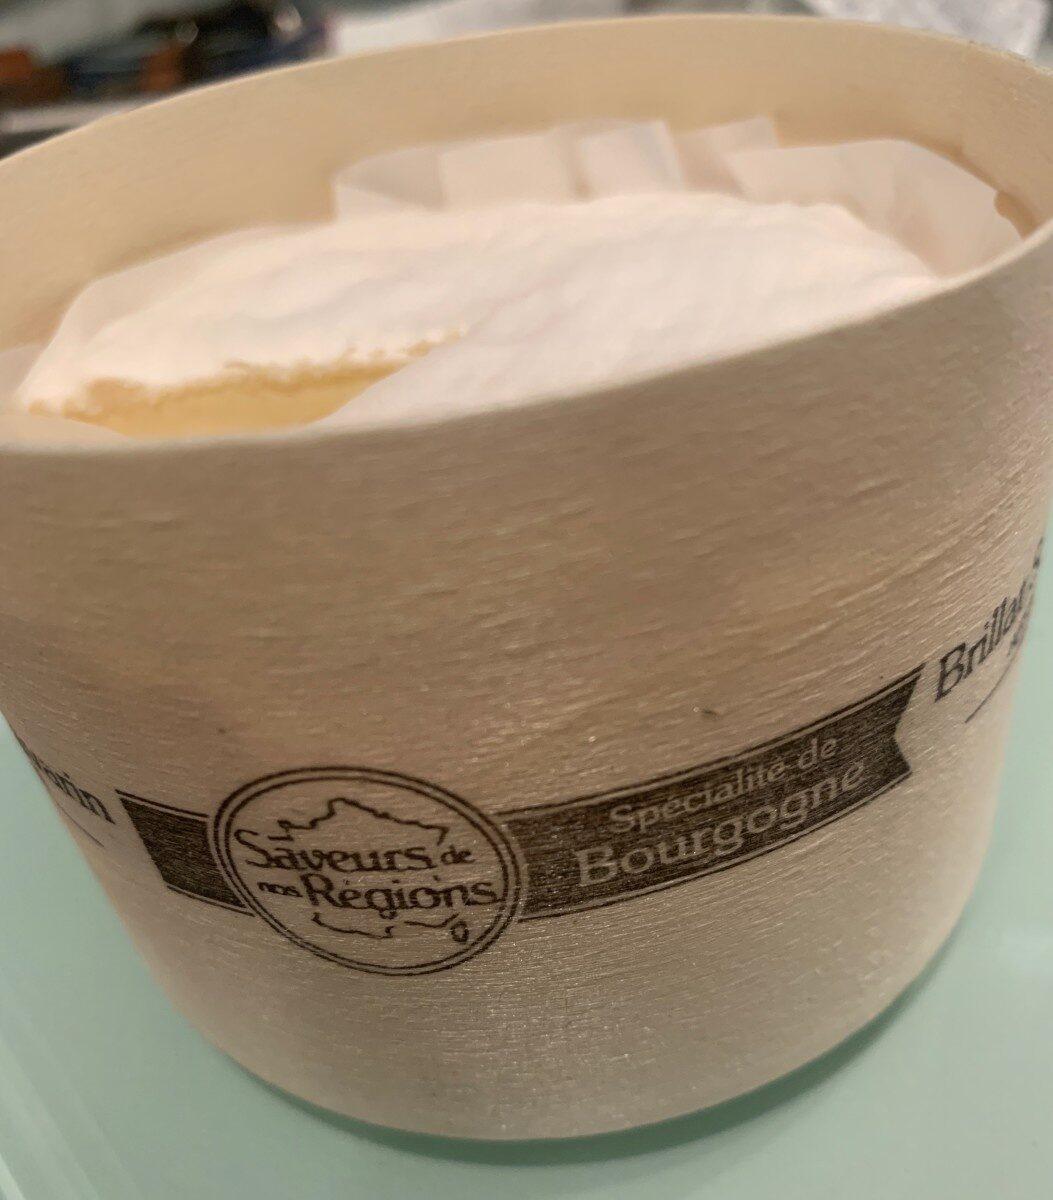 Brillat Savarin - Product - fr